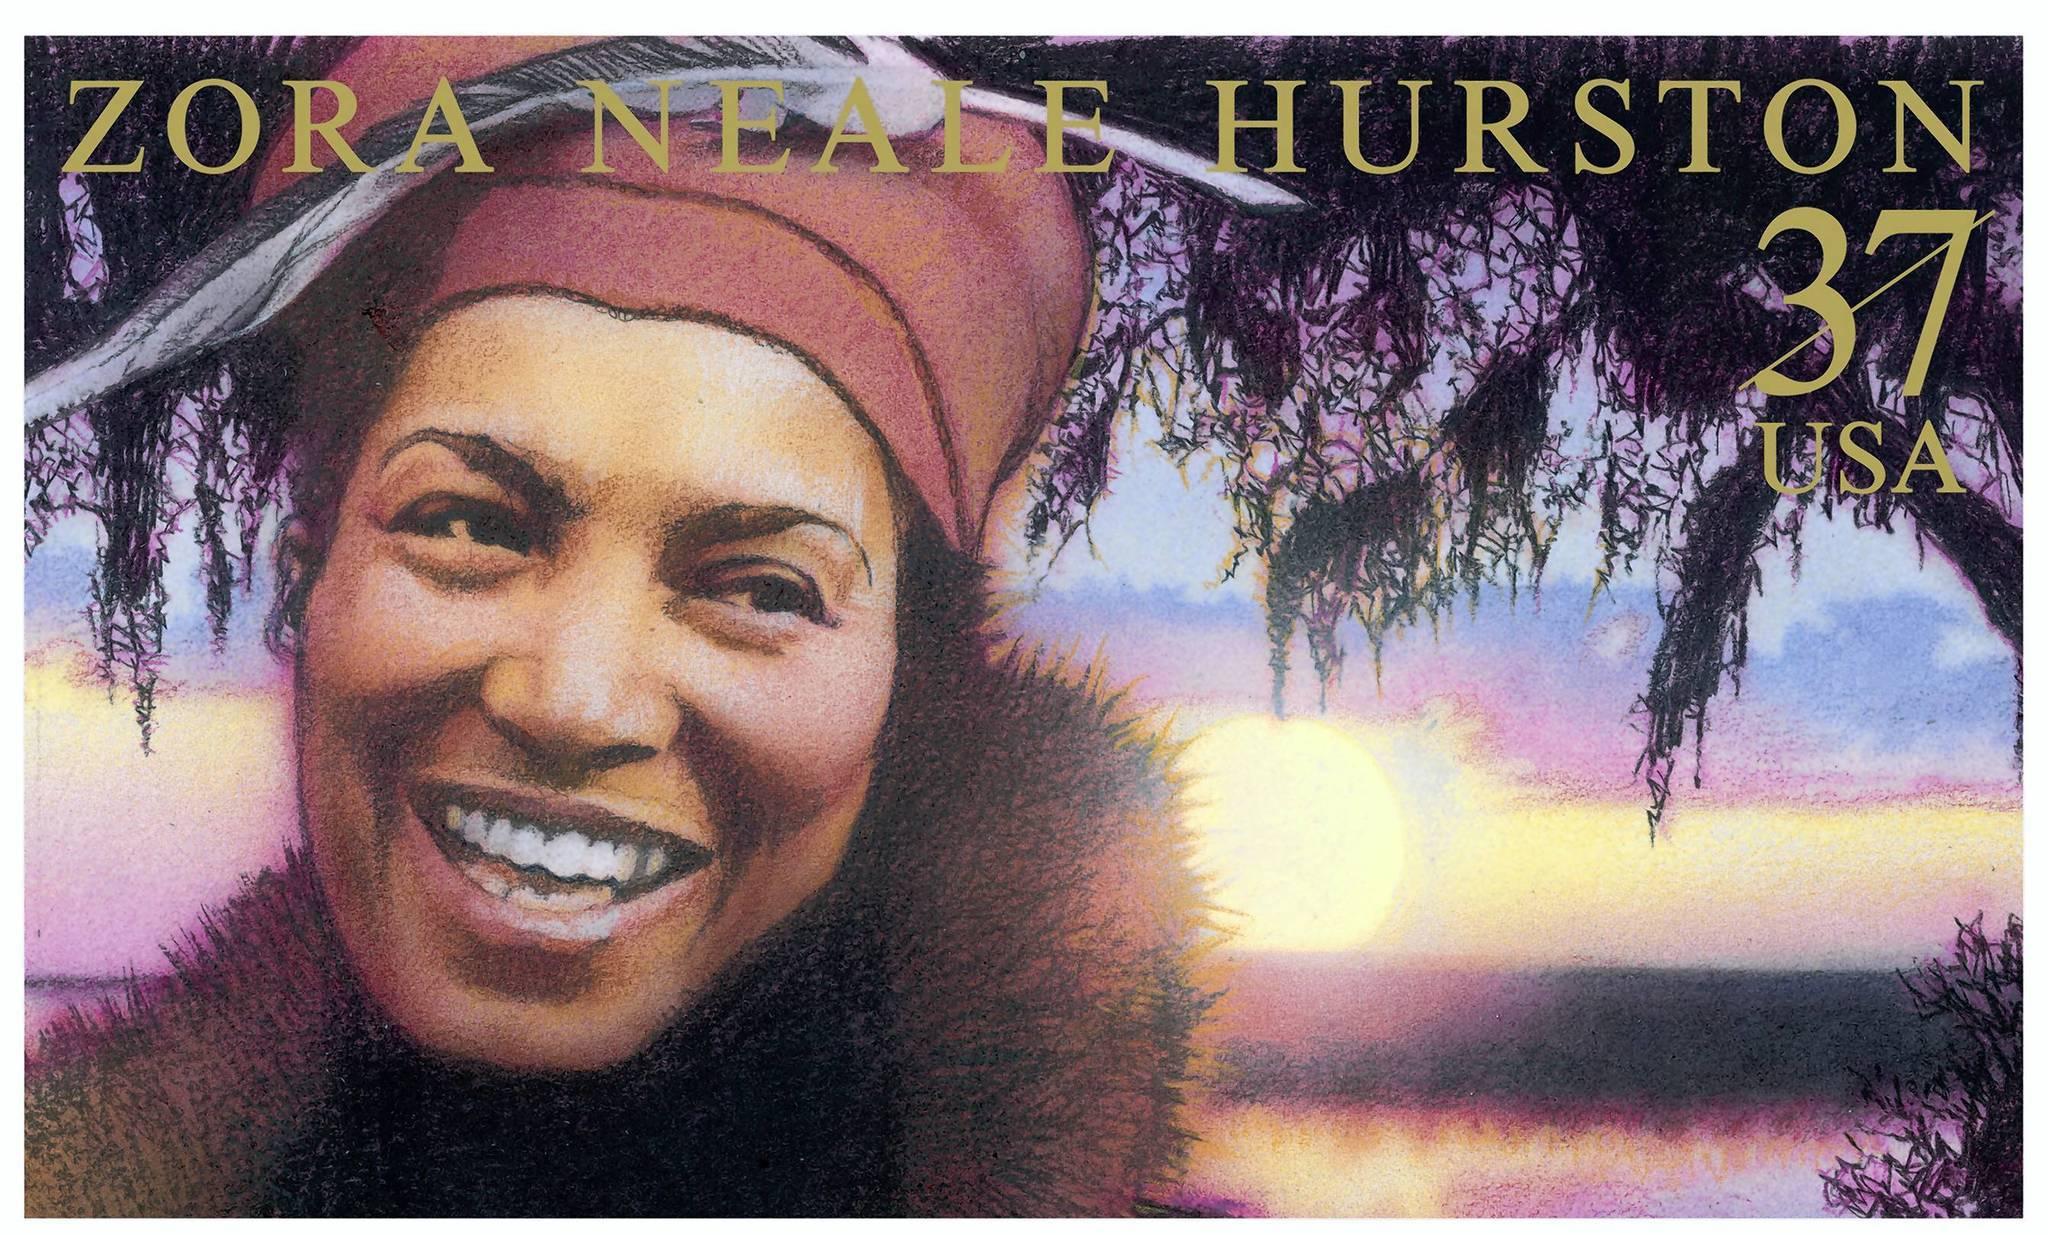 Florida History: Celebrate Hurston's Masterwork At 75 With